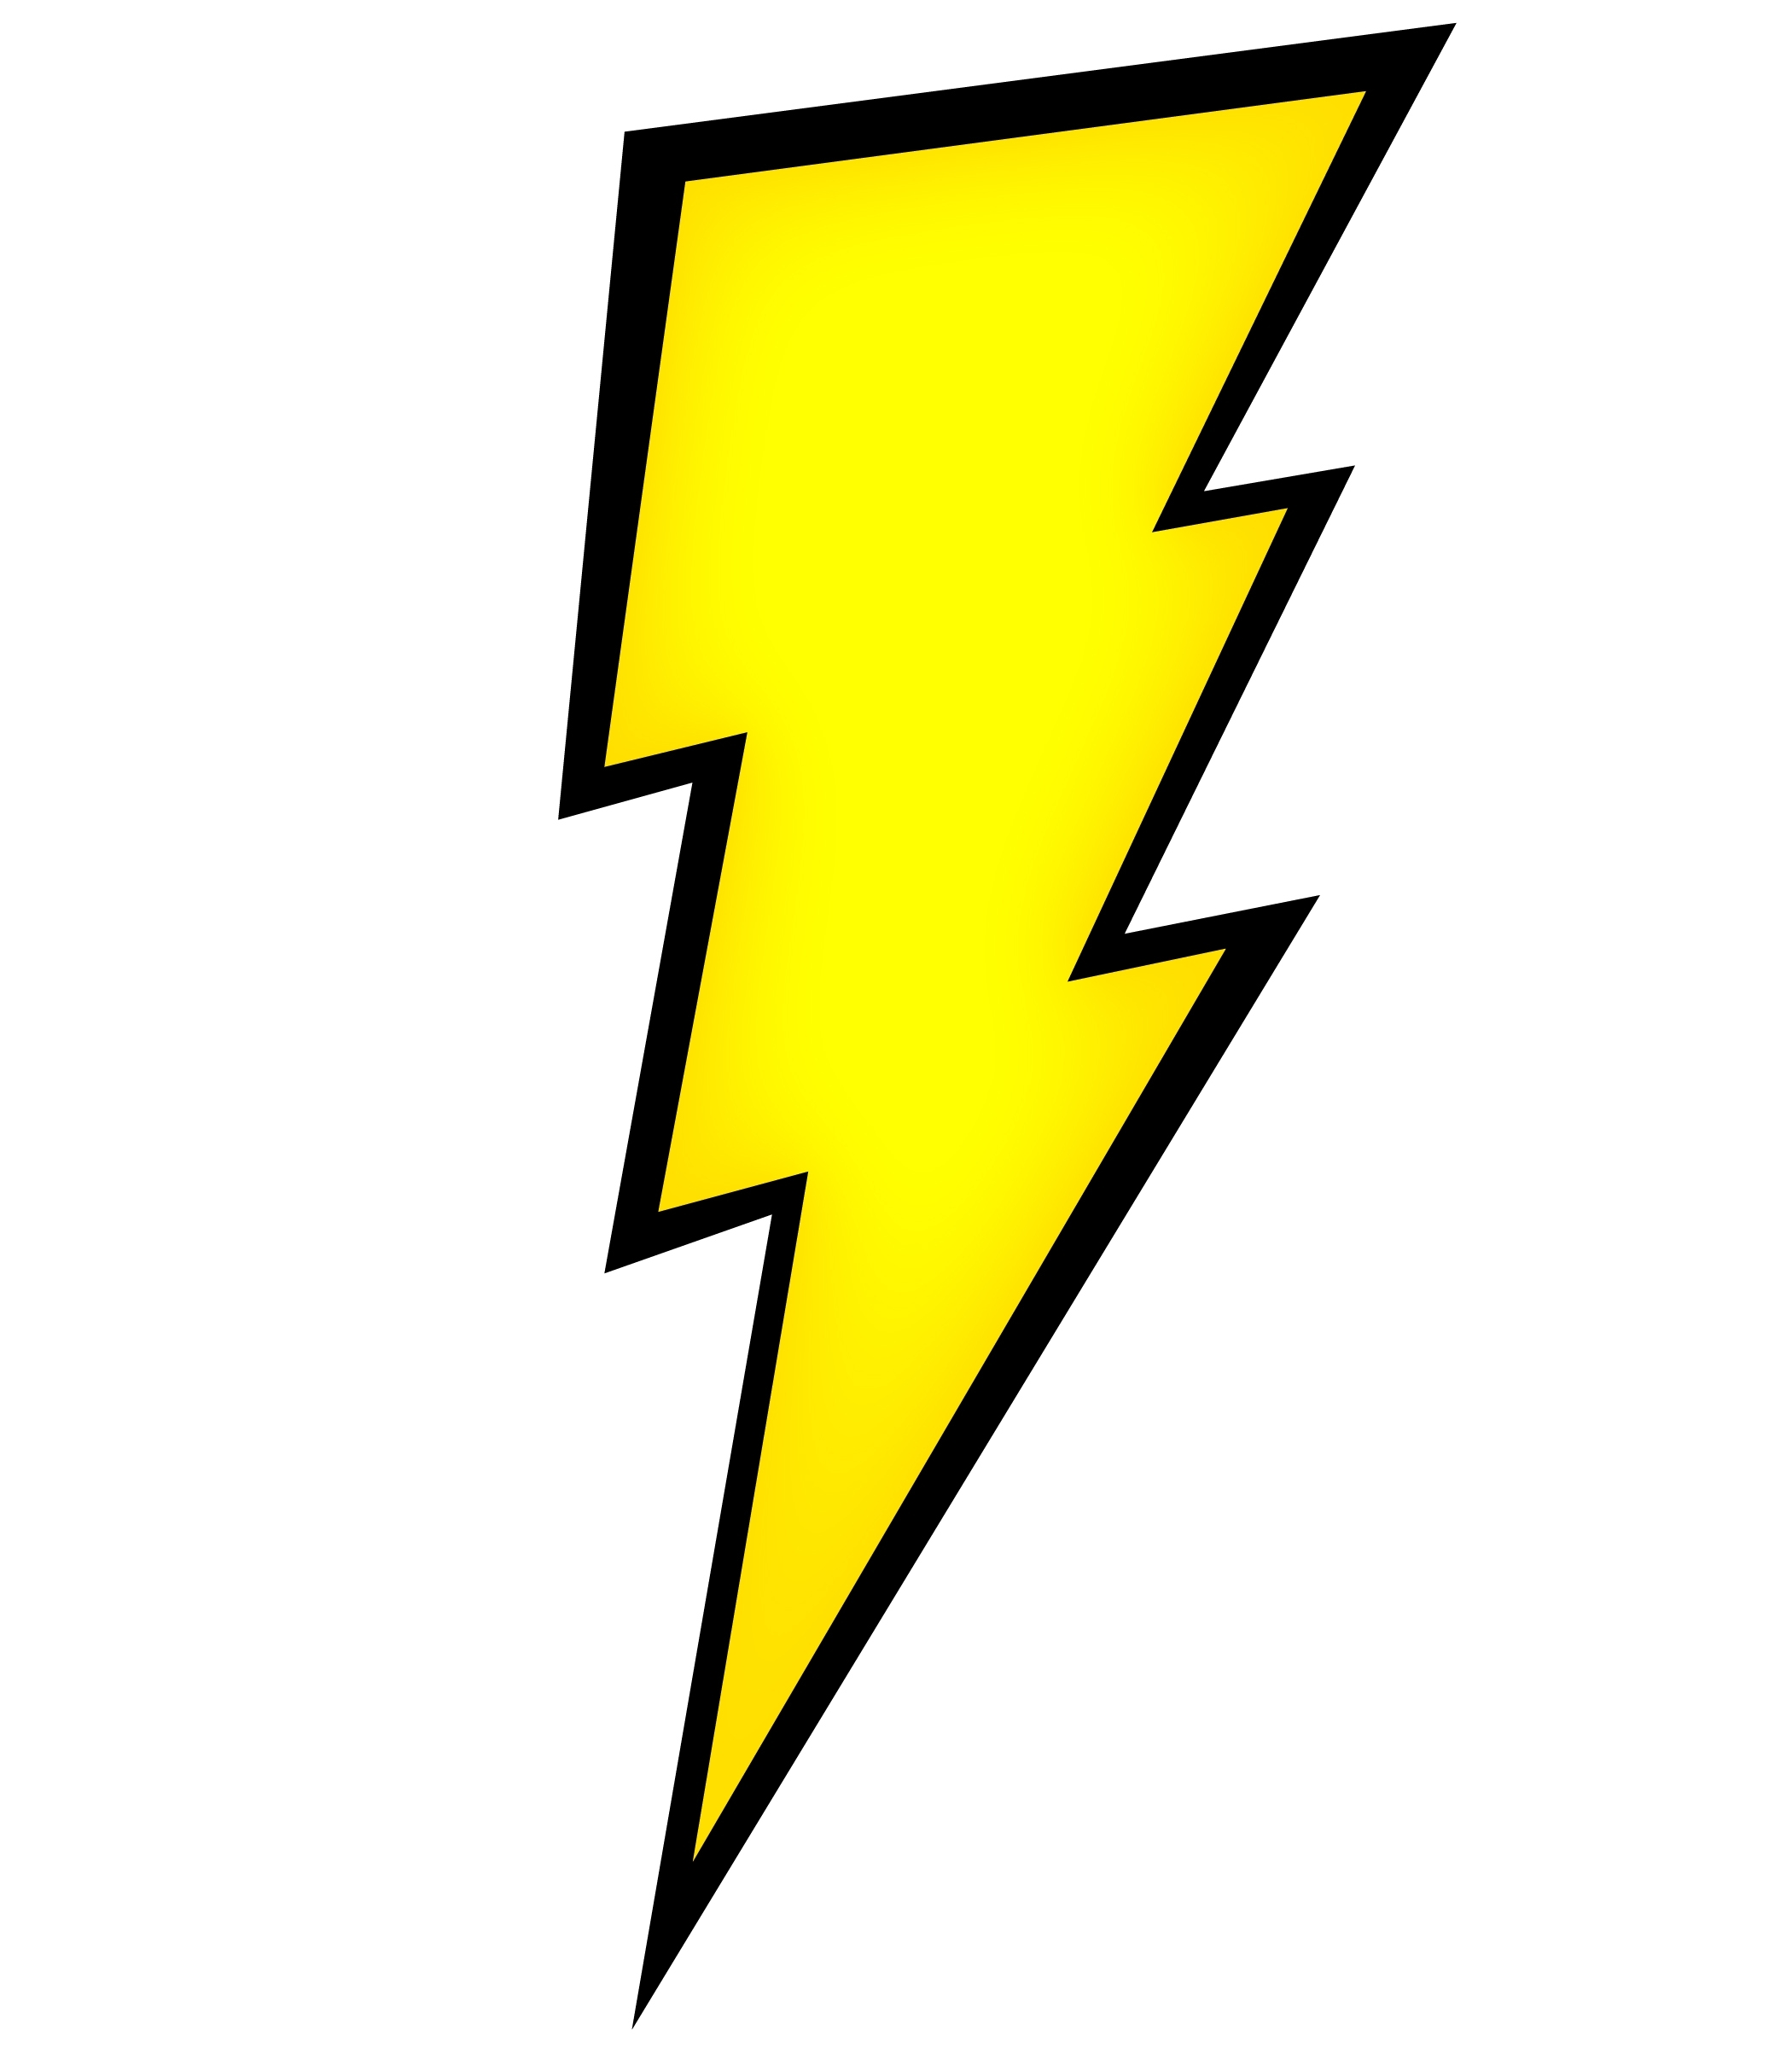 lightning-bolt-clipart-dc6mx6qc9.jpeg